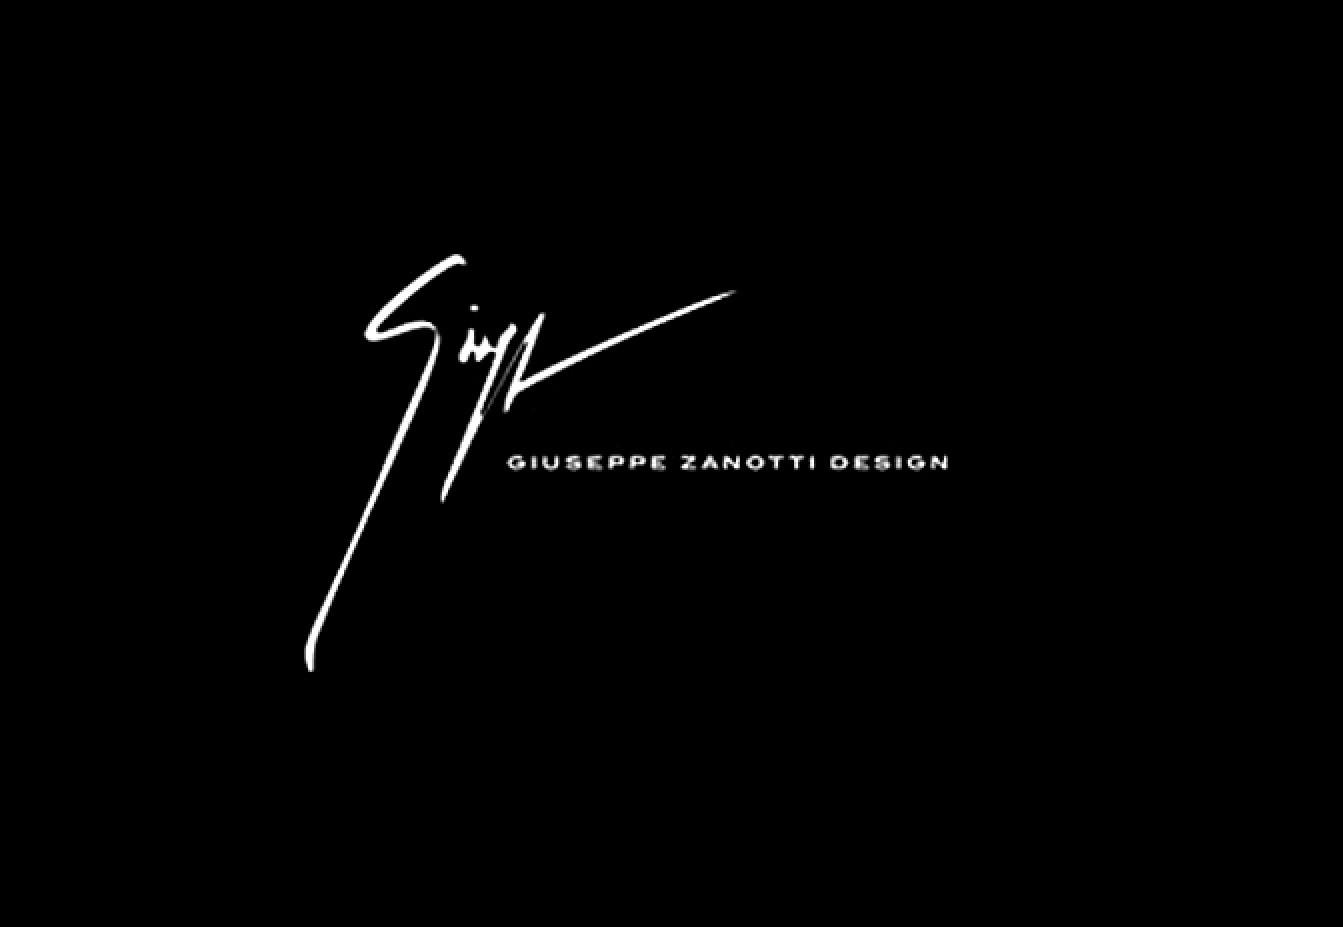 giuseppe-zanotti-small-logo.jpg